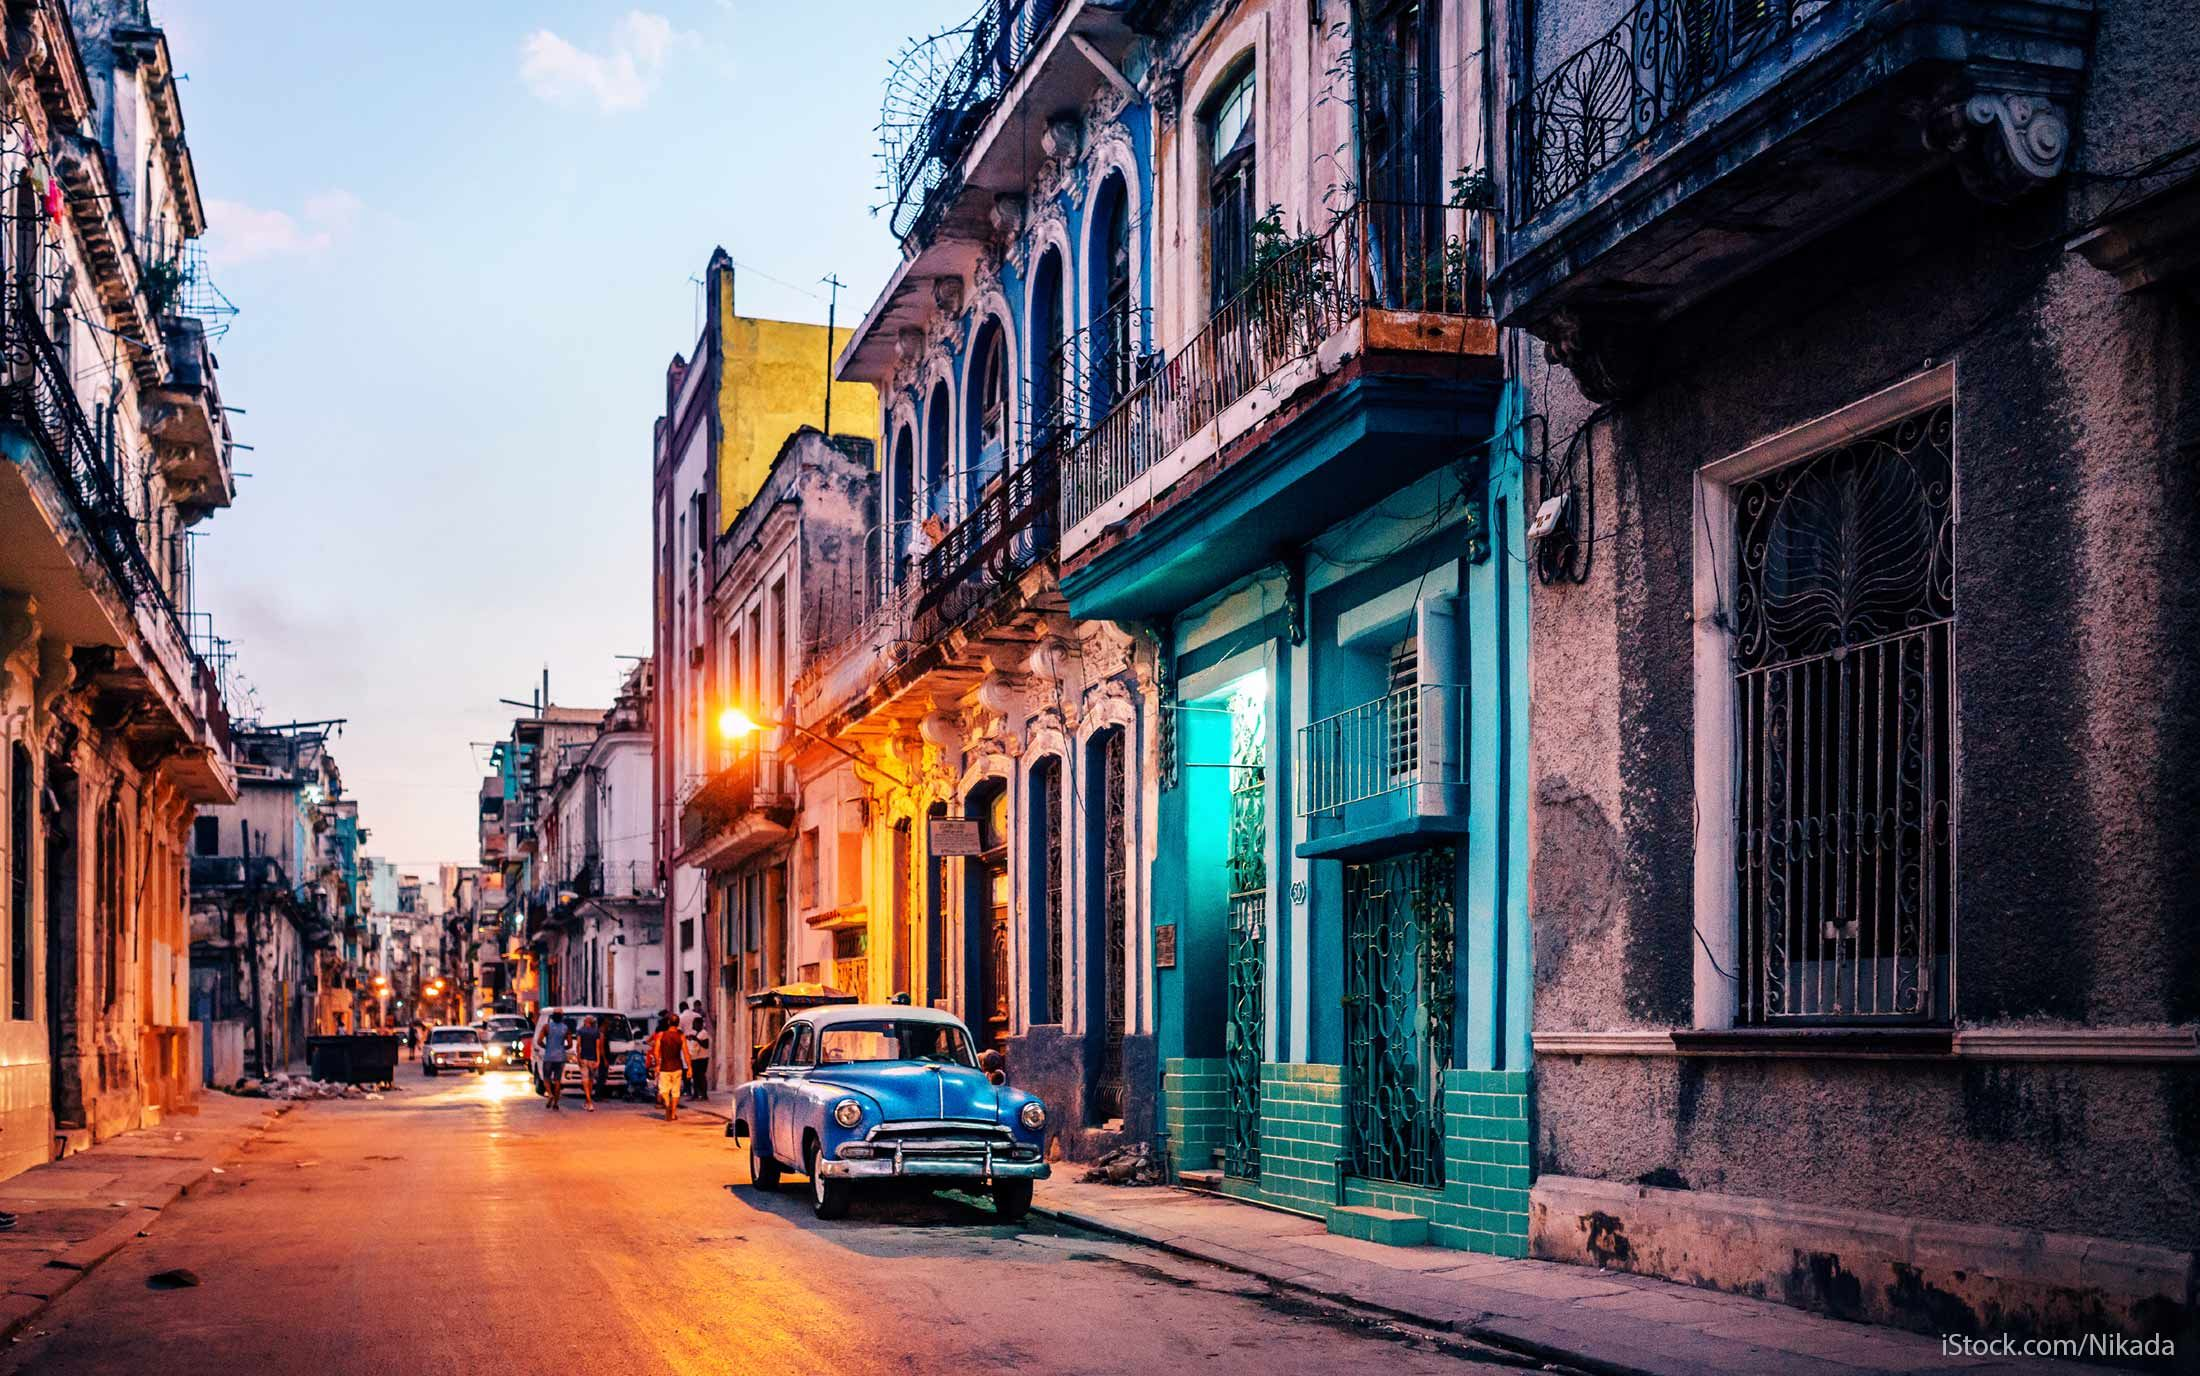 Cuba tourism photo of a street